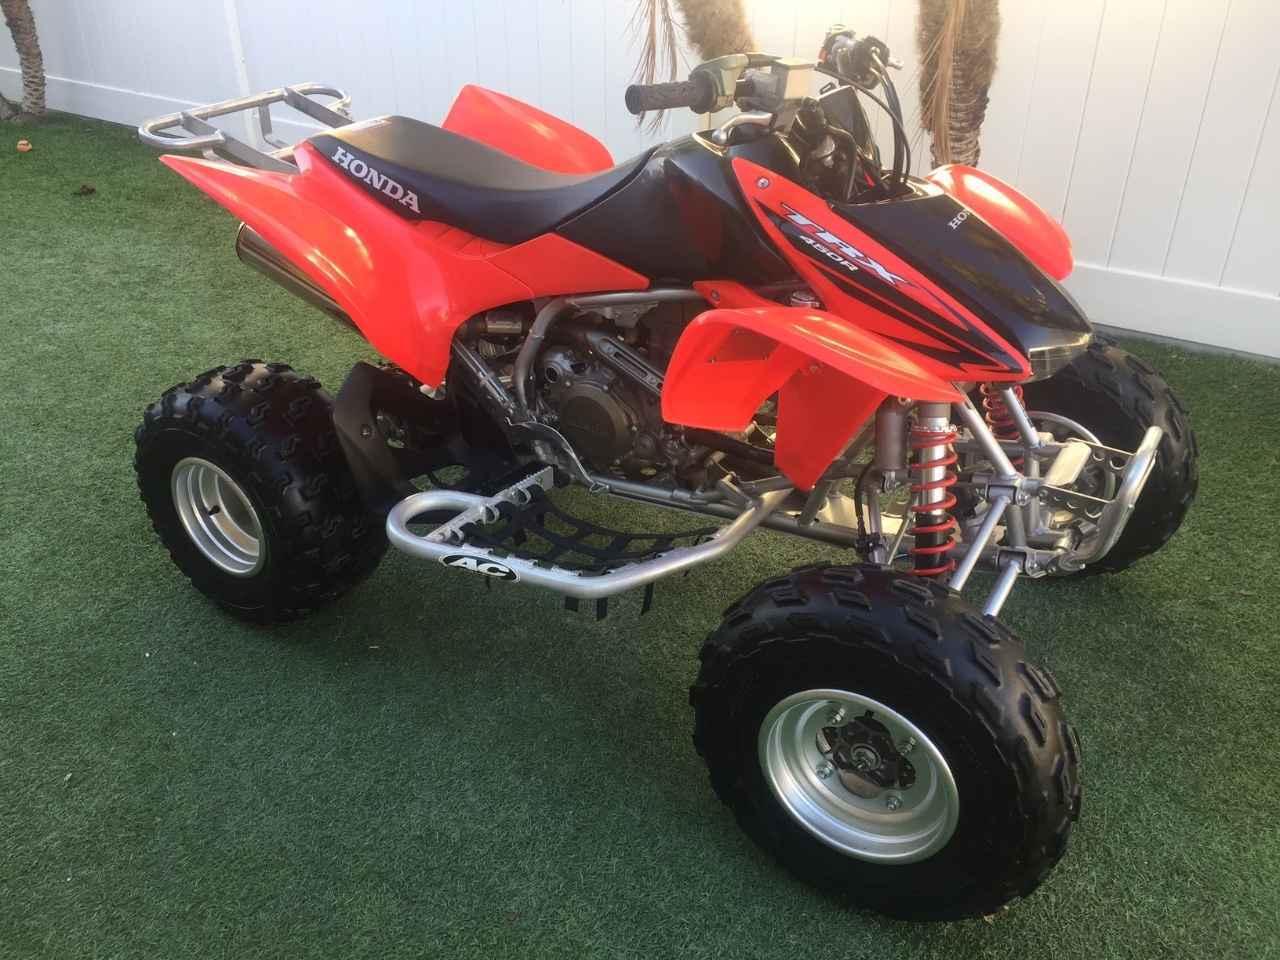 Used 2007 Honda Atvs Atvs For Sale In California On Atv Trades